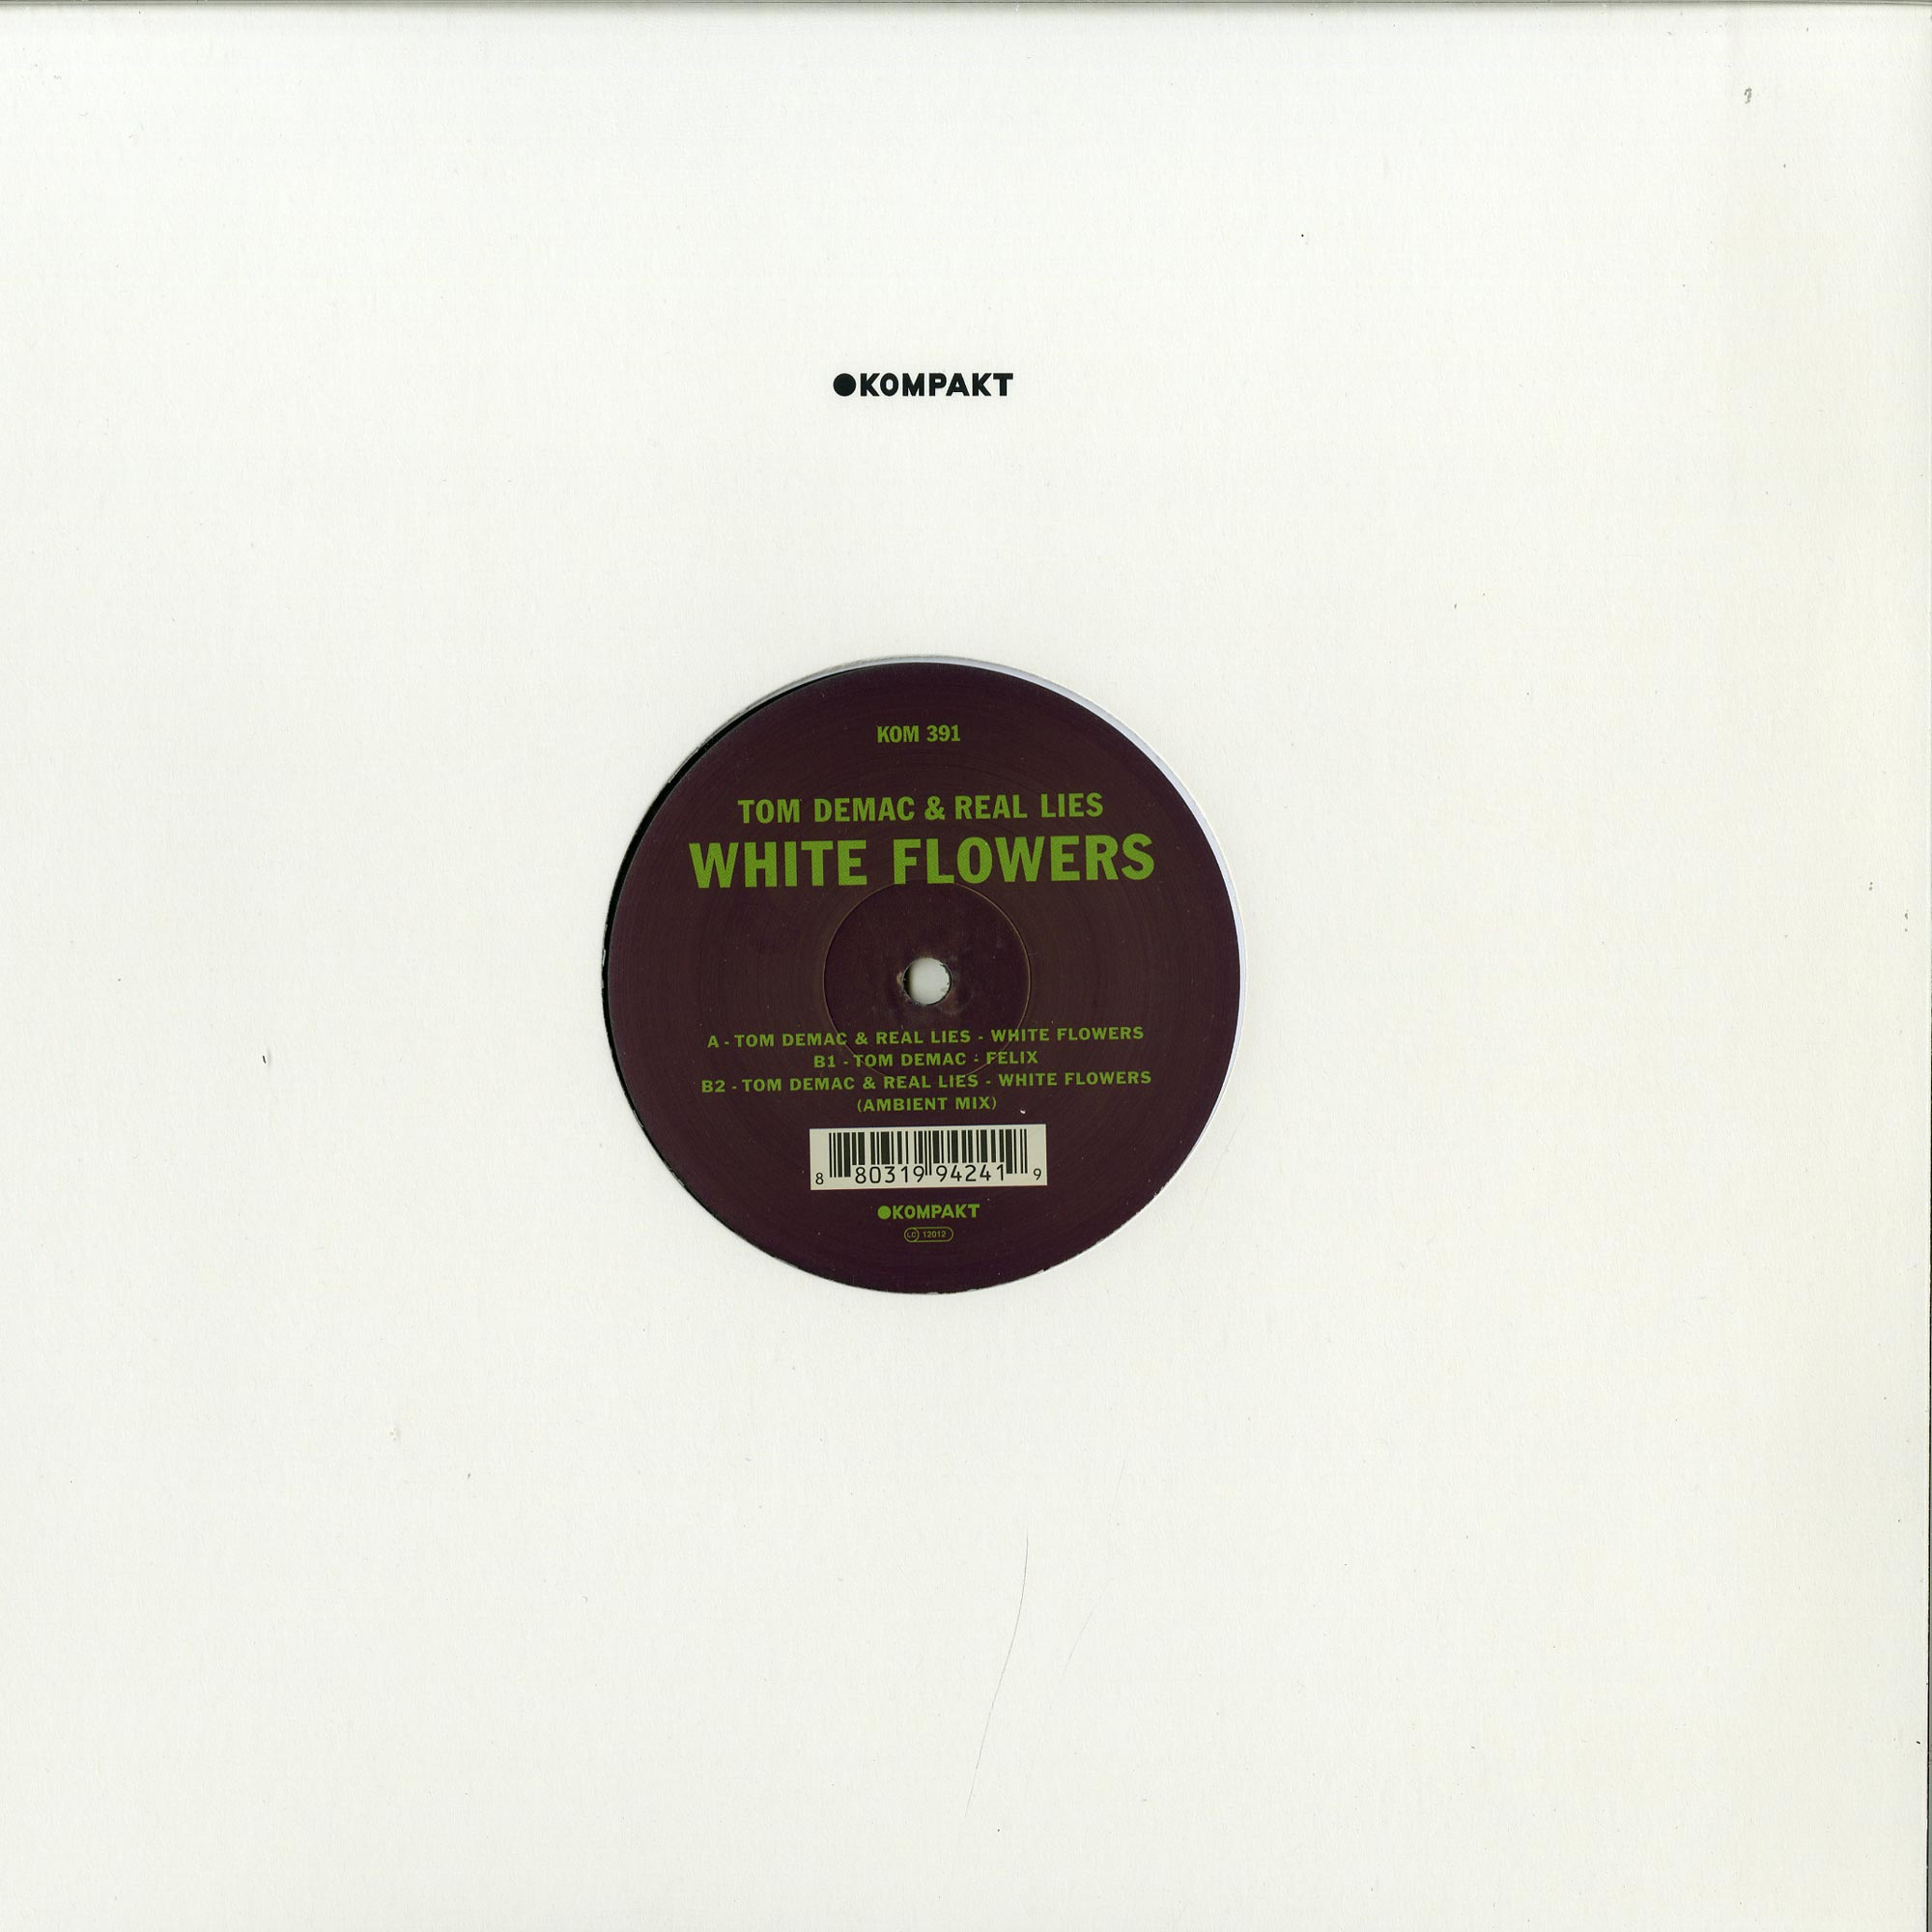 Tom Demac & Real Lies - WHITE FLOWERS